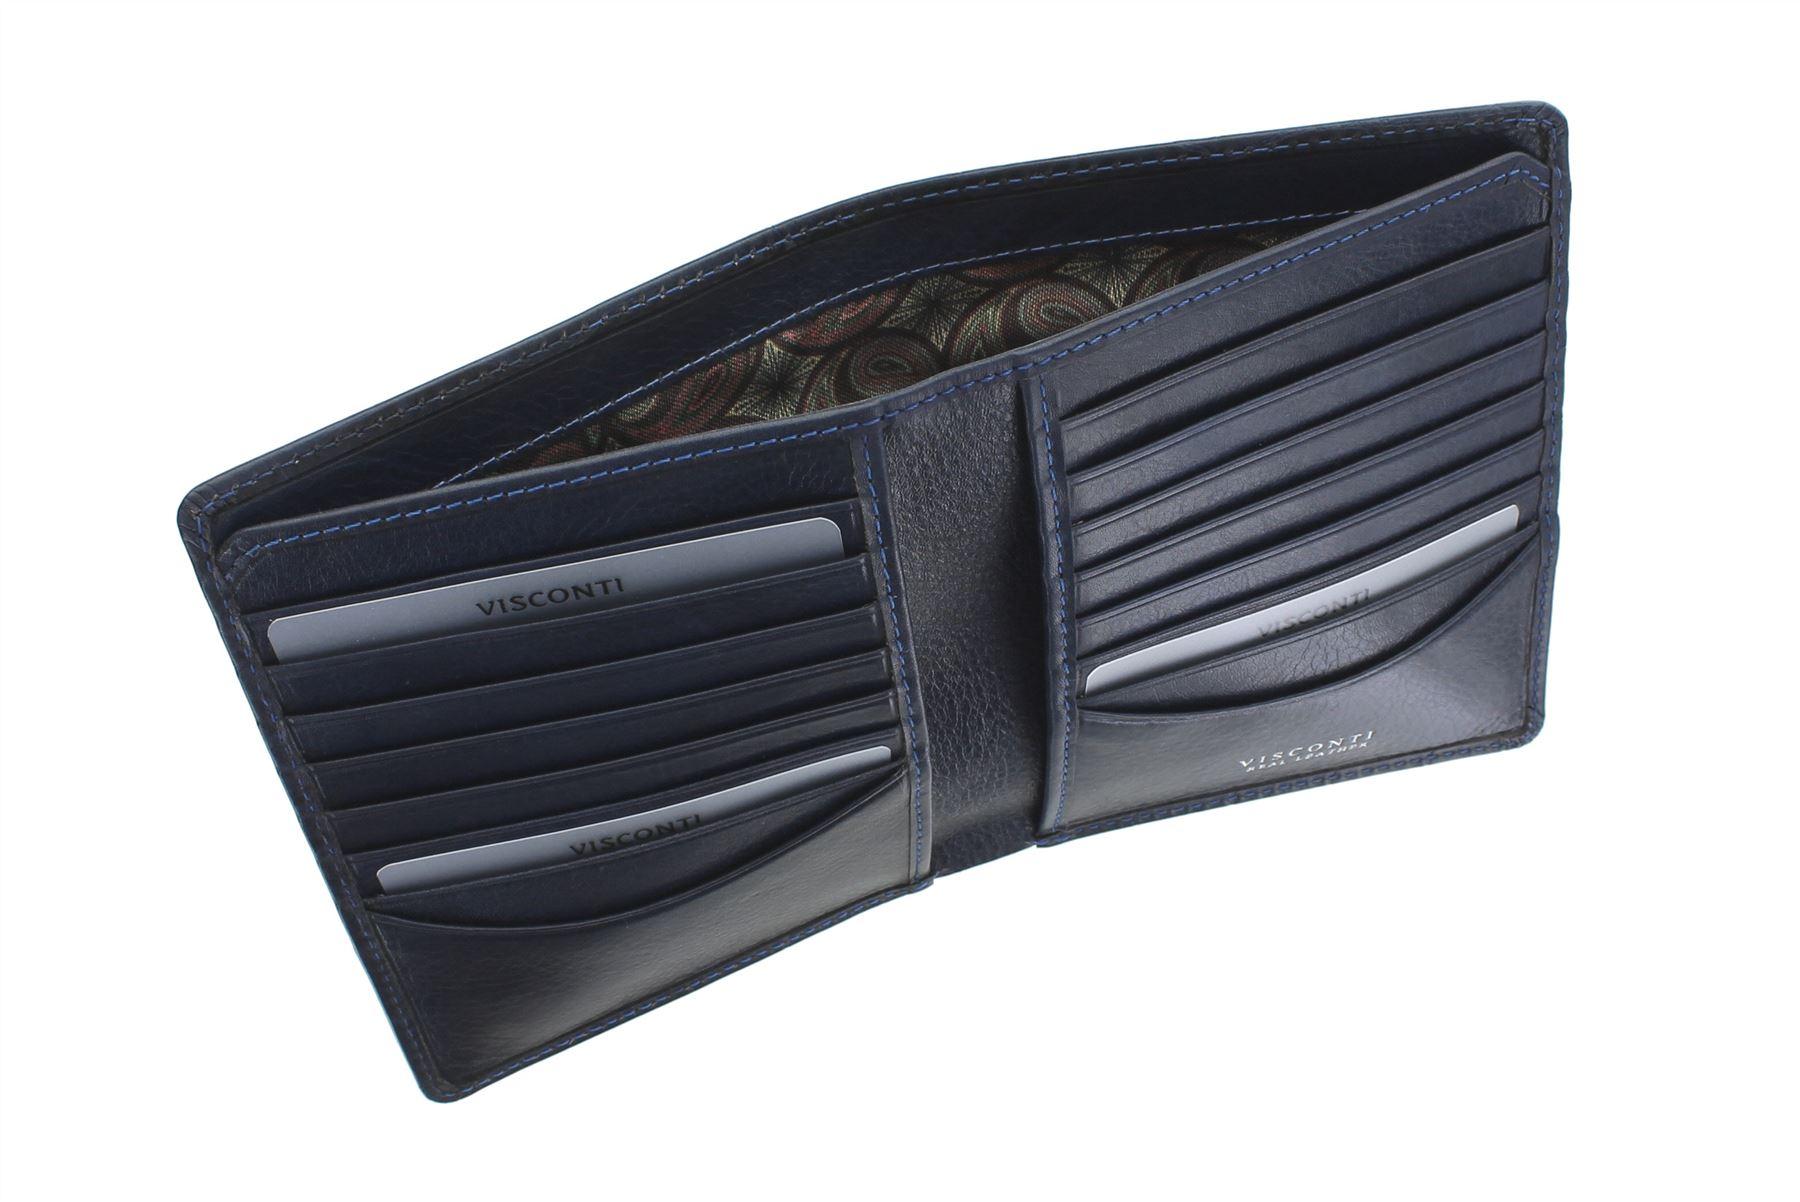 RFID Protected CR93 Visconti Croco Collection PREDATOR Leather Jacket Wallet